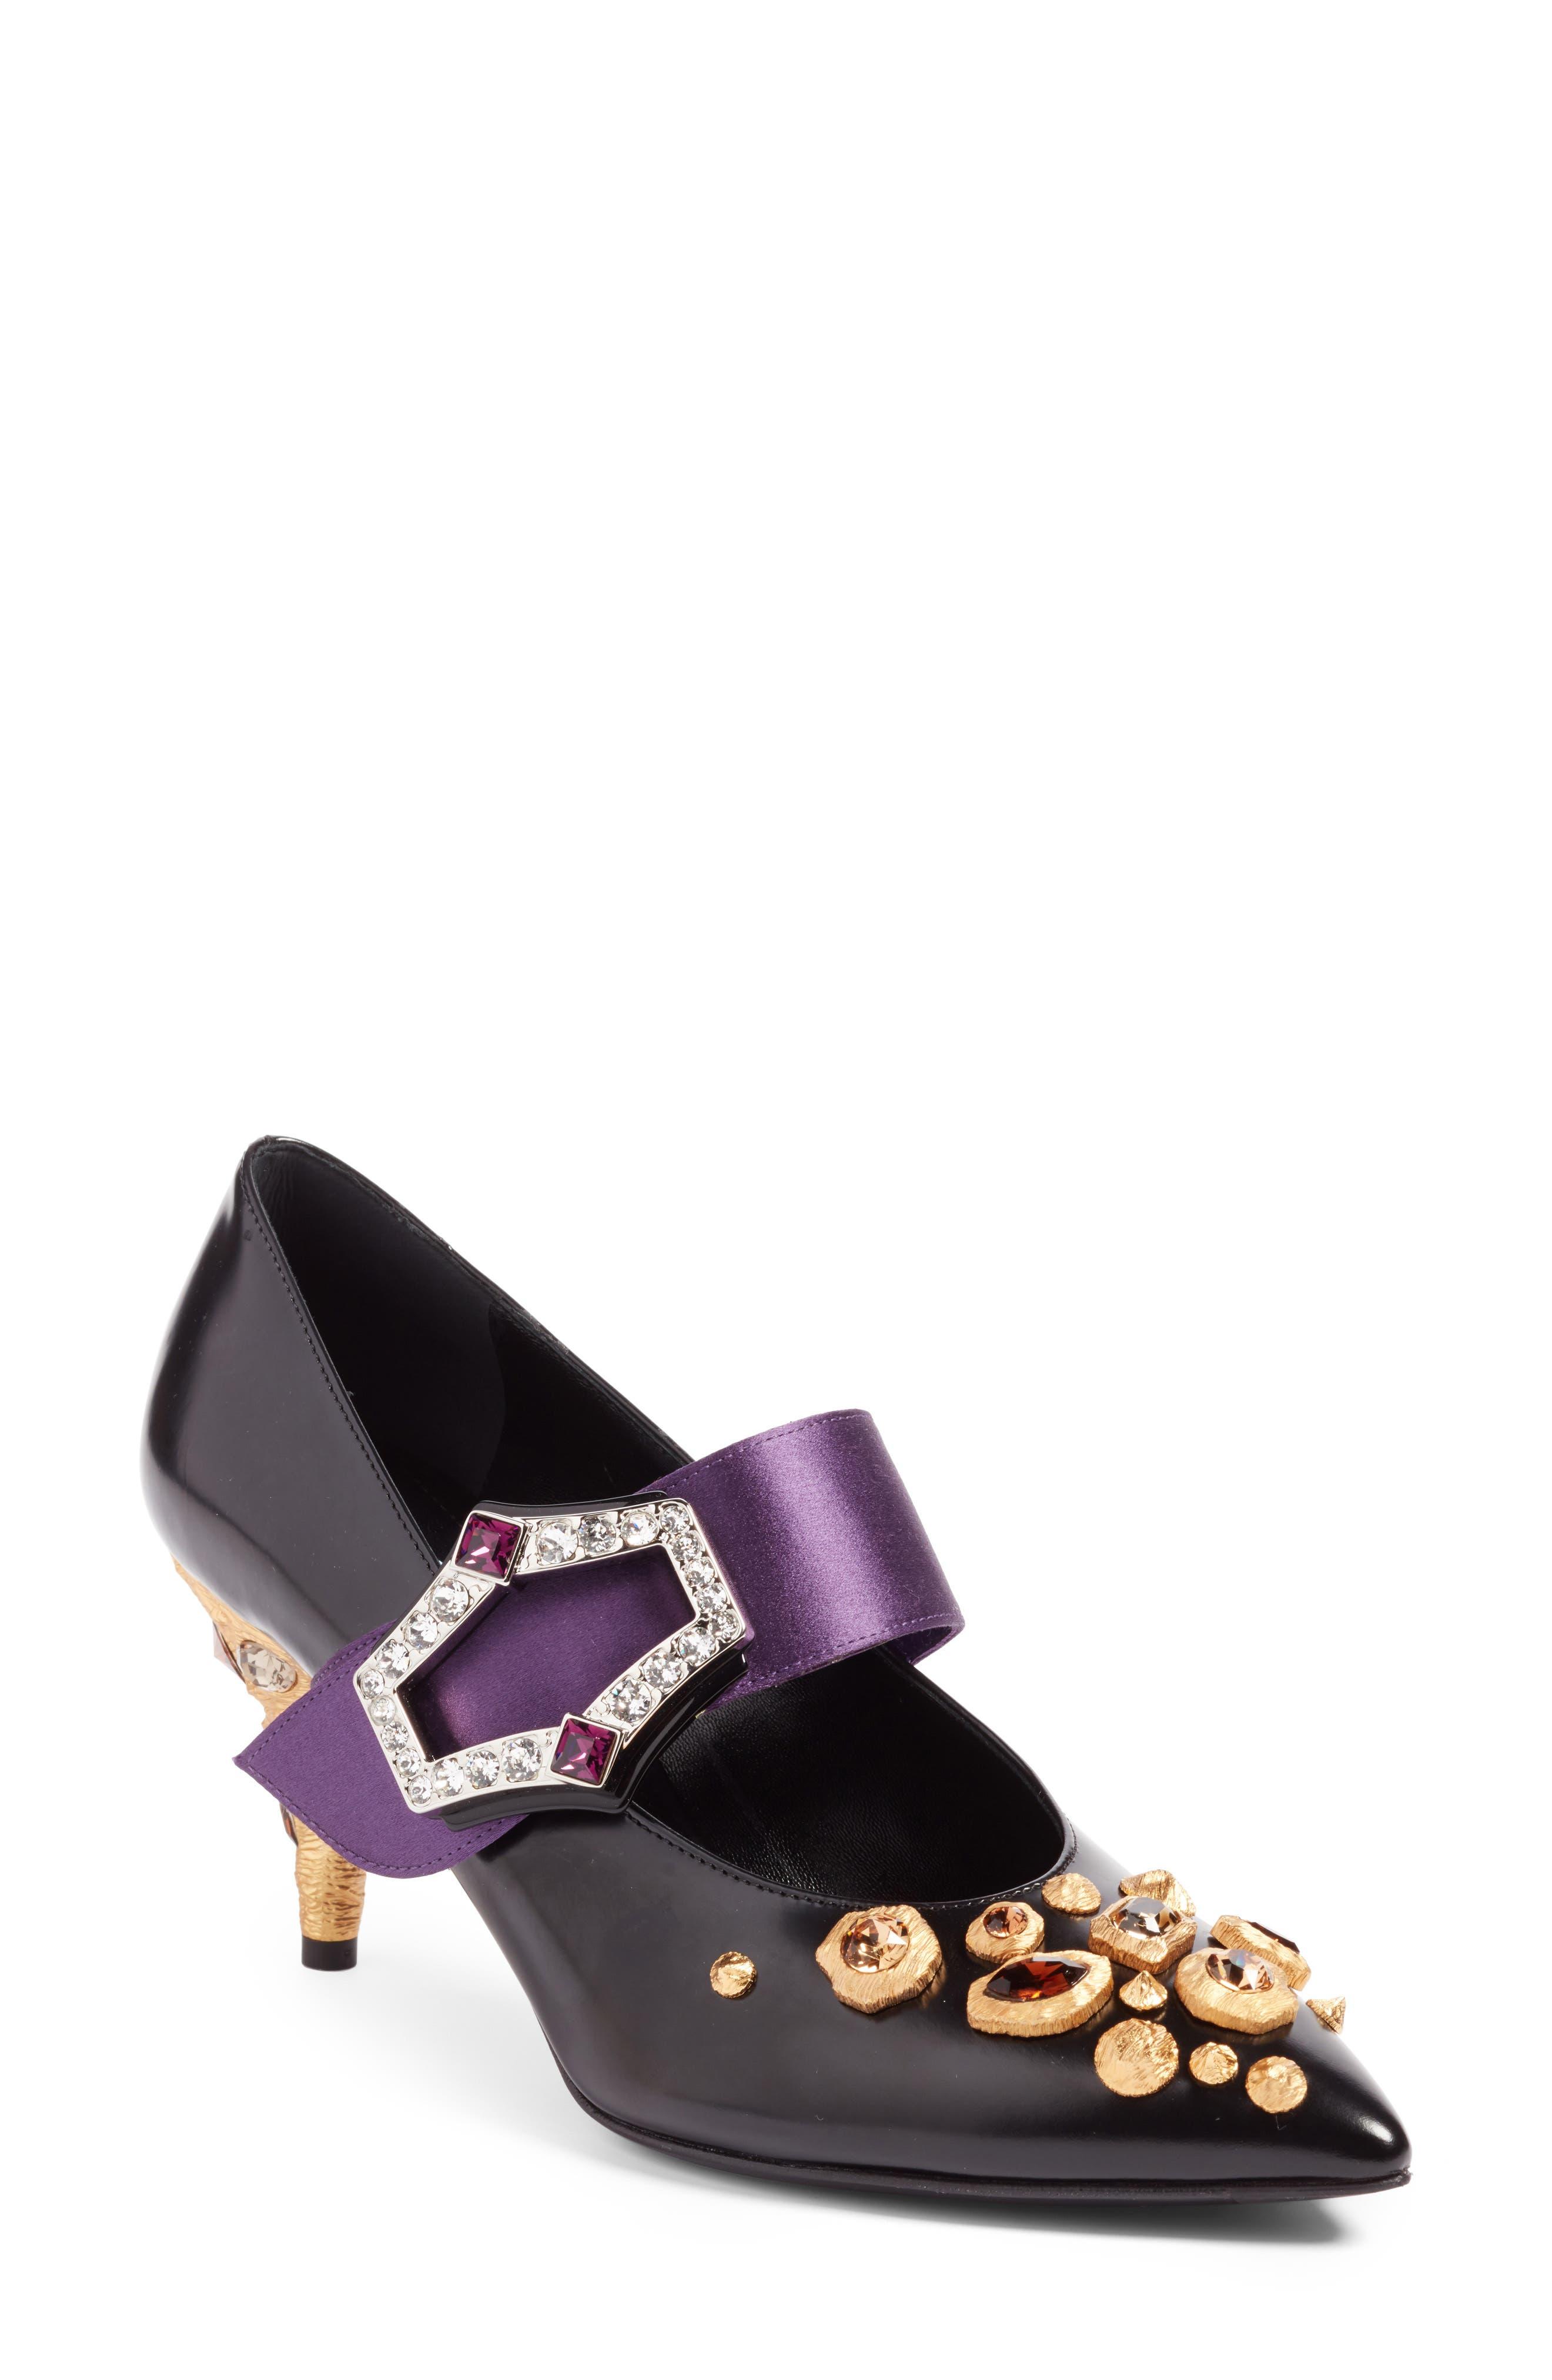 Jeweled Mary Jane Pump,                         Main,                         color, Black/ Purple